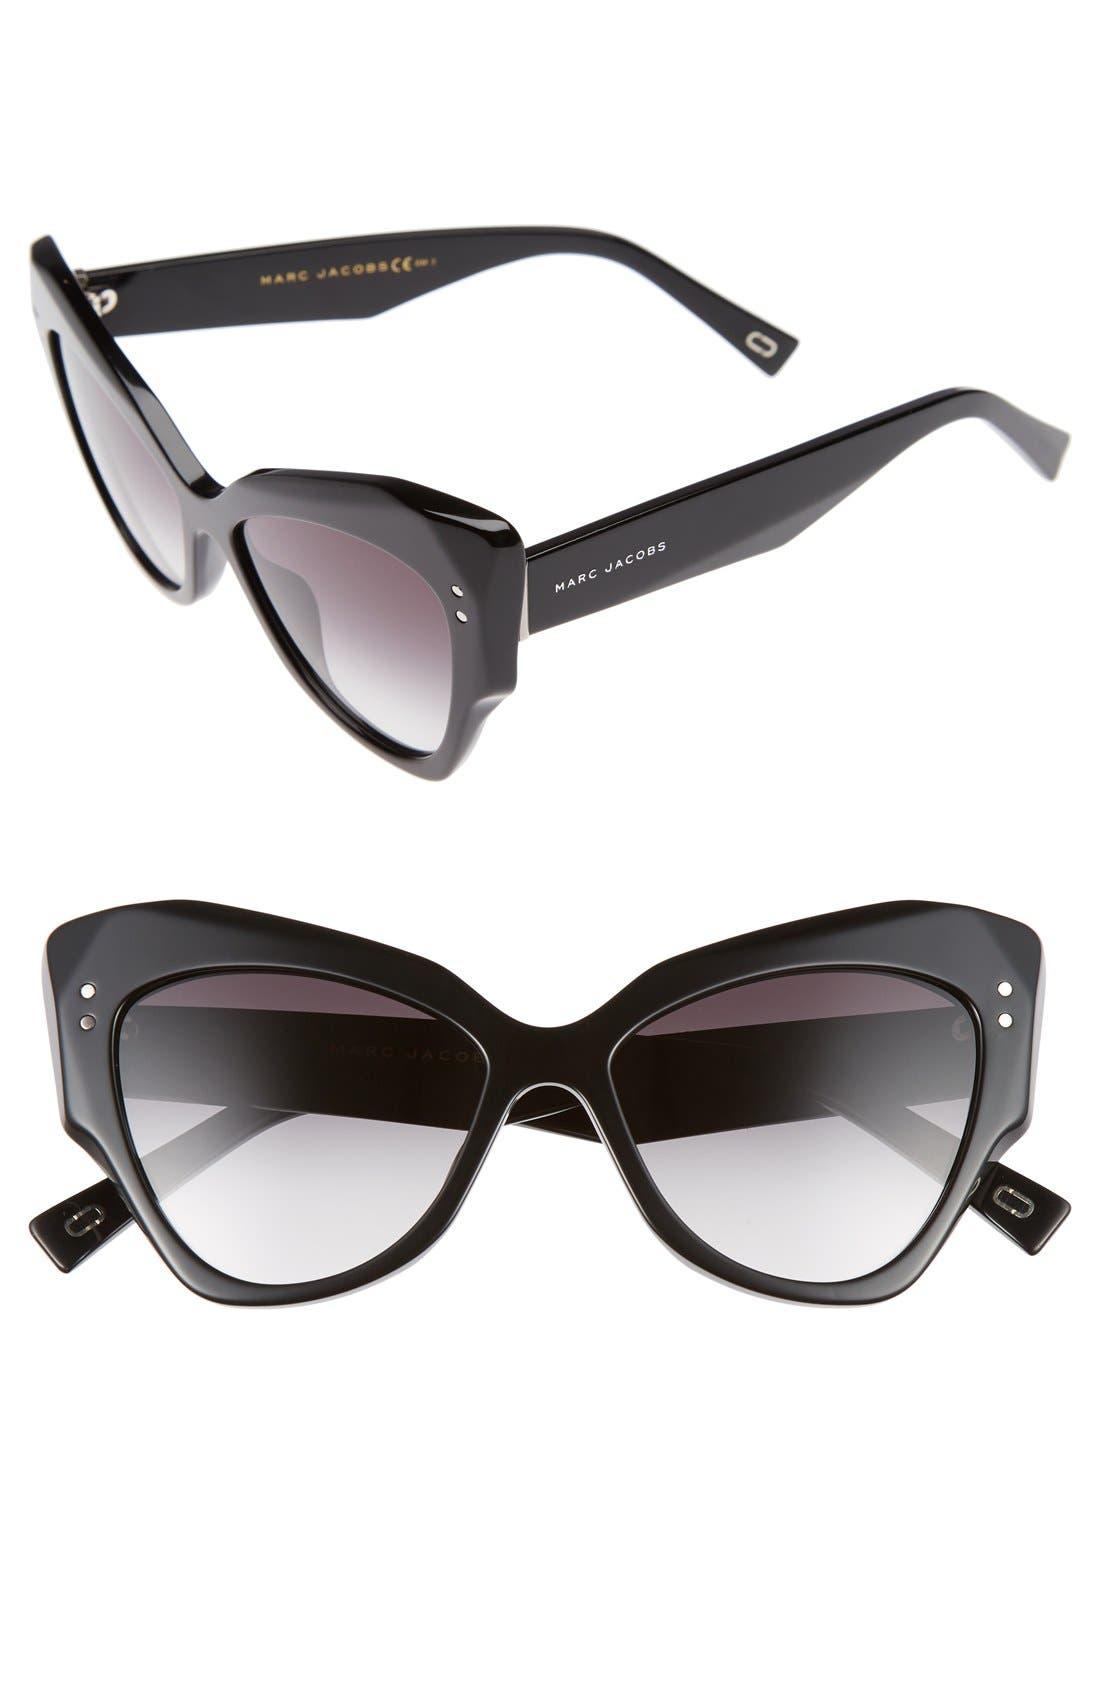 52mm Cat Eye Sunglasses,                             Main thumbnail 1, color,                             Black